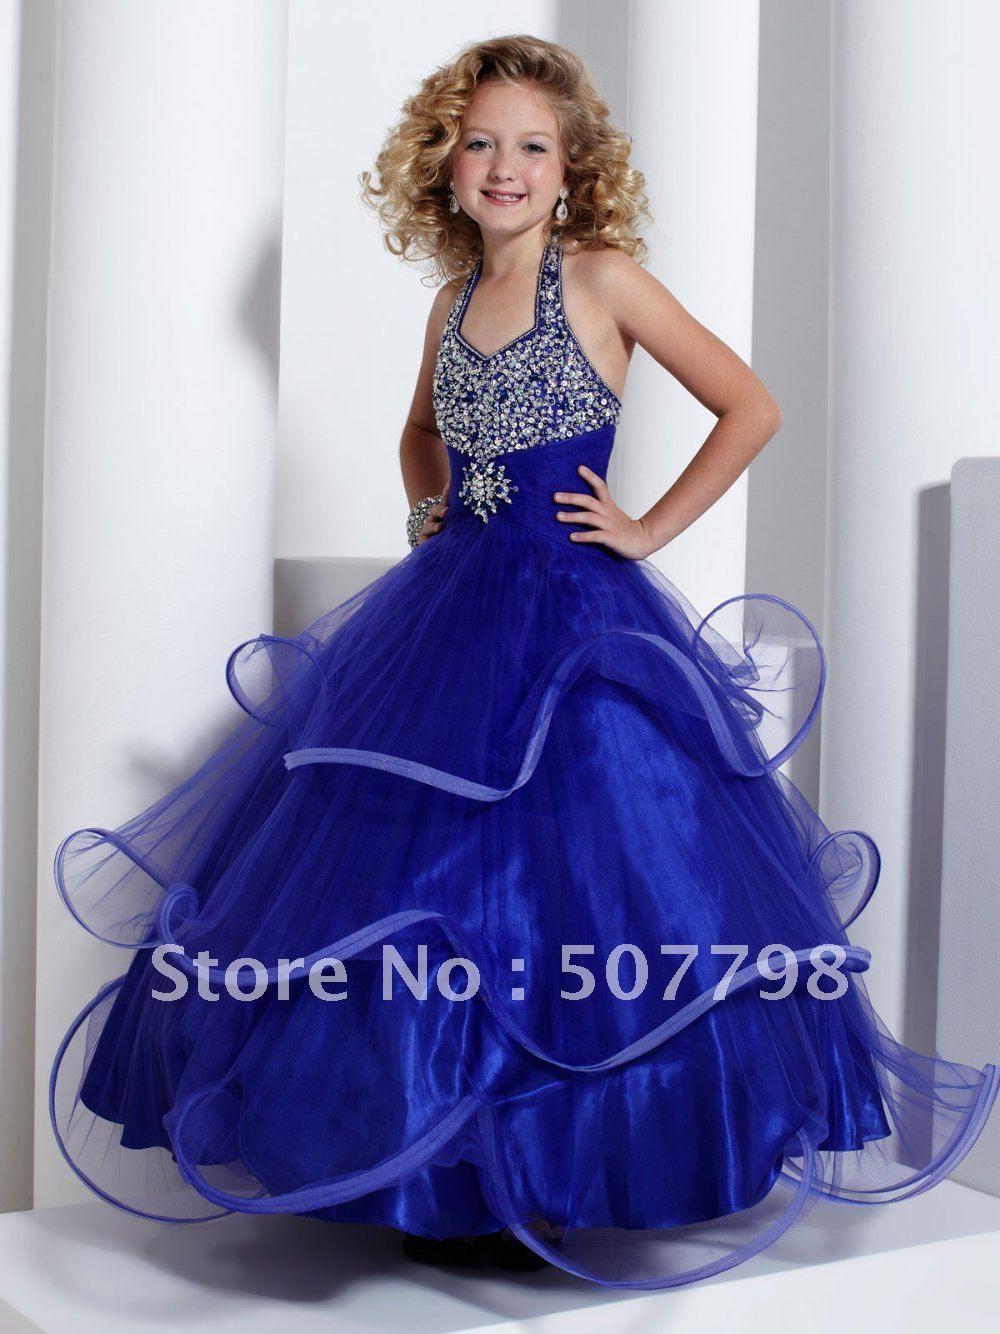 Aliexpress Buy Tiffany Princess Girl Dress Blue halter | детки ...